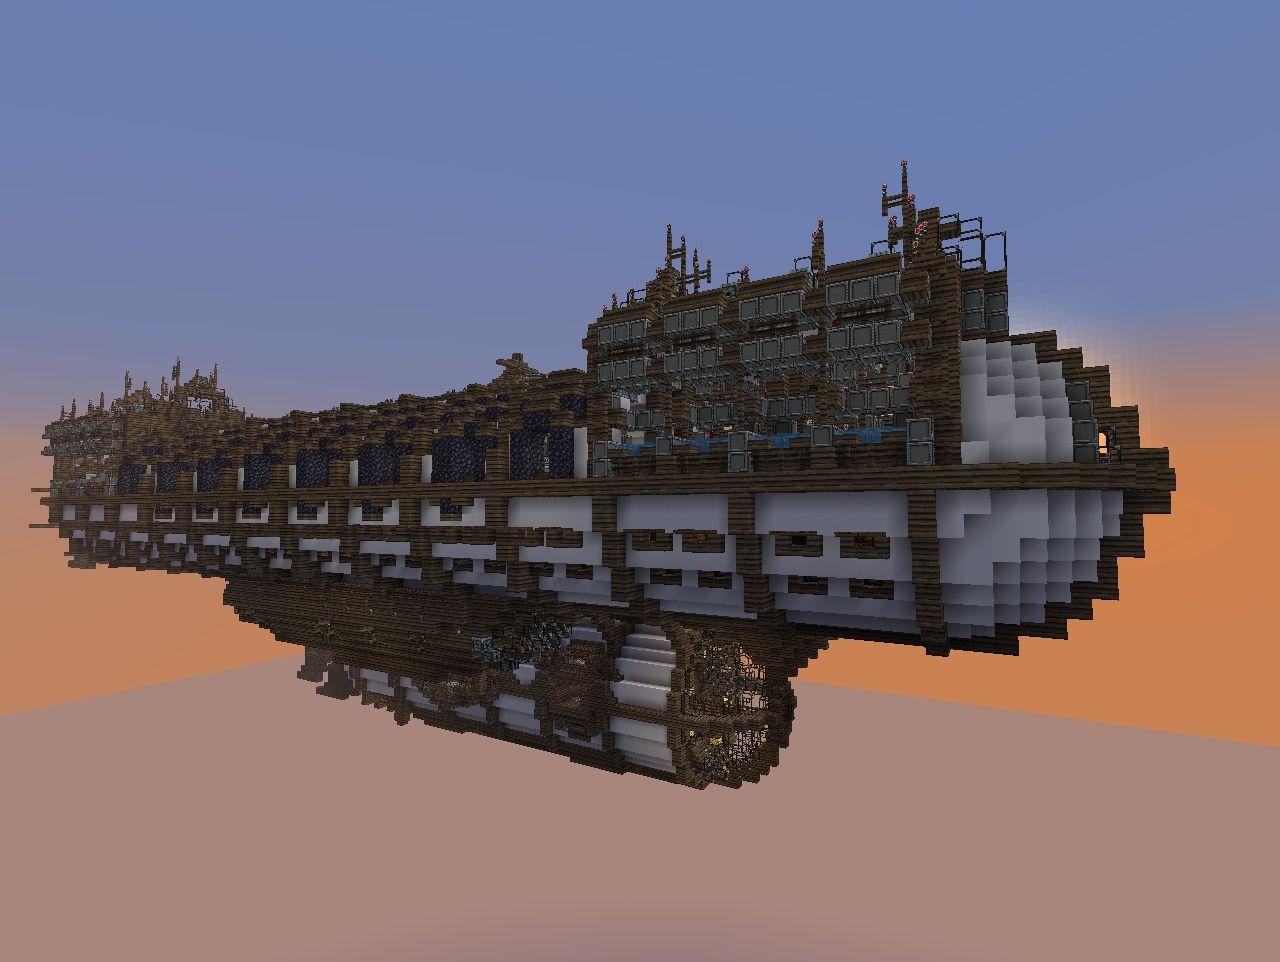 The Gargantua Warship